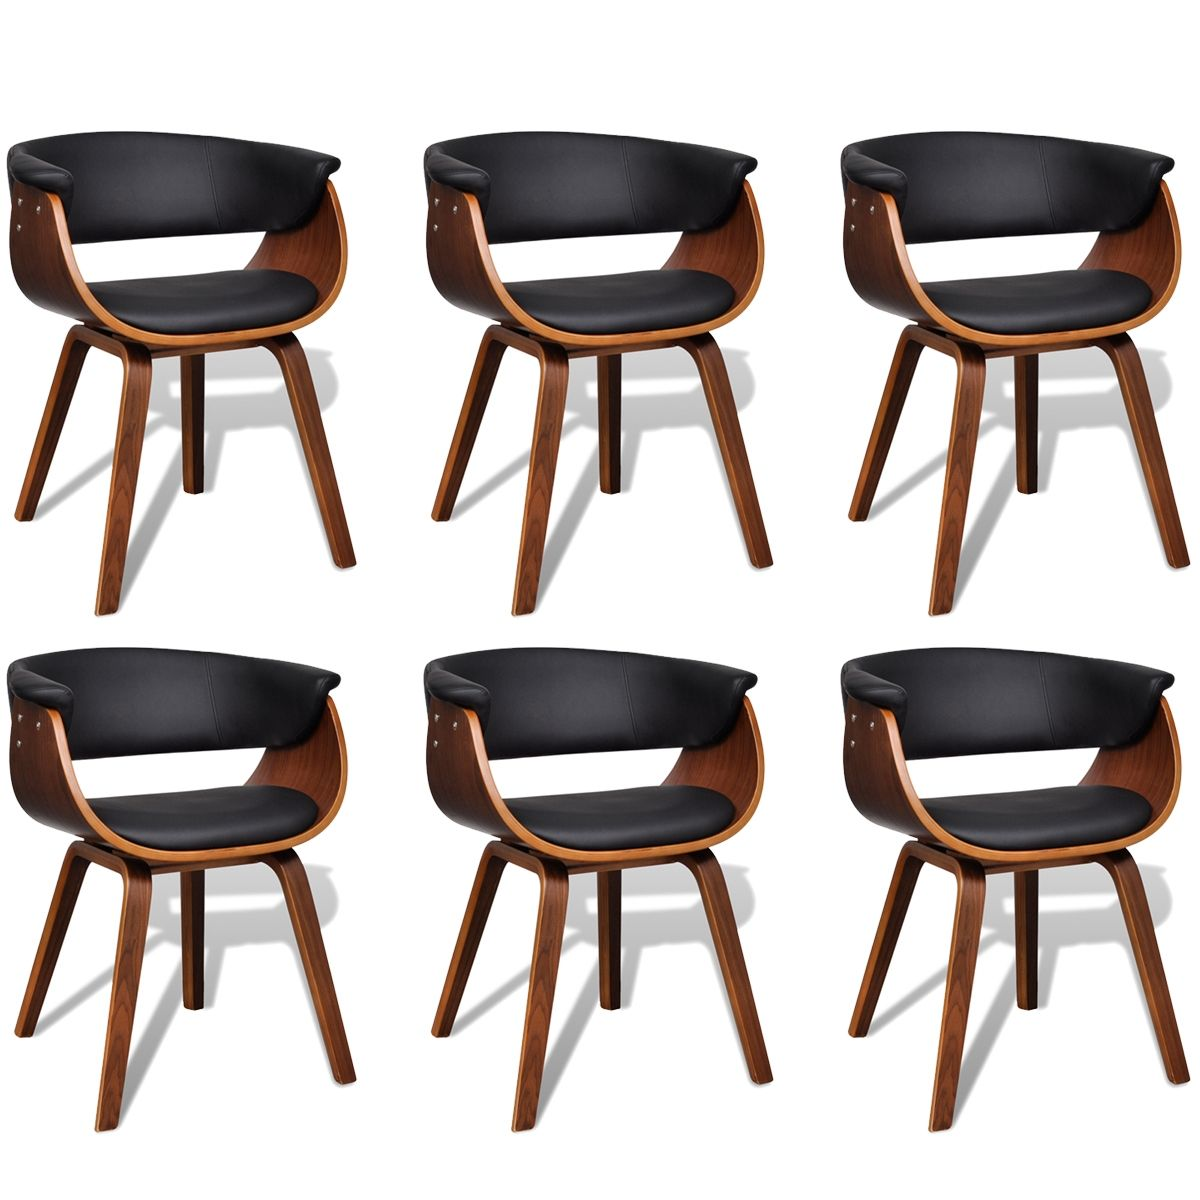 Affordable Details Zu Esszimmer Stuhl Sthle Sessel Holzrahmen Sofa With  Sofa Mit Holzrahmen